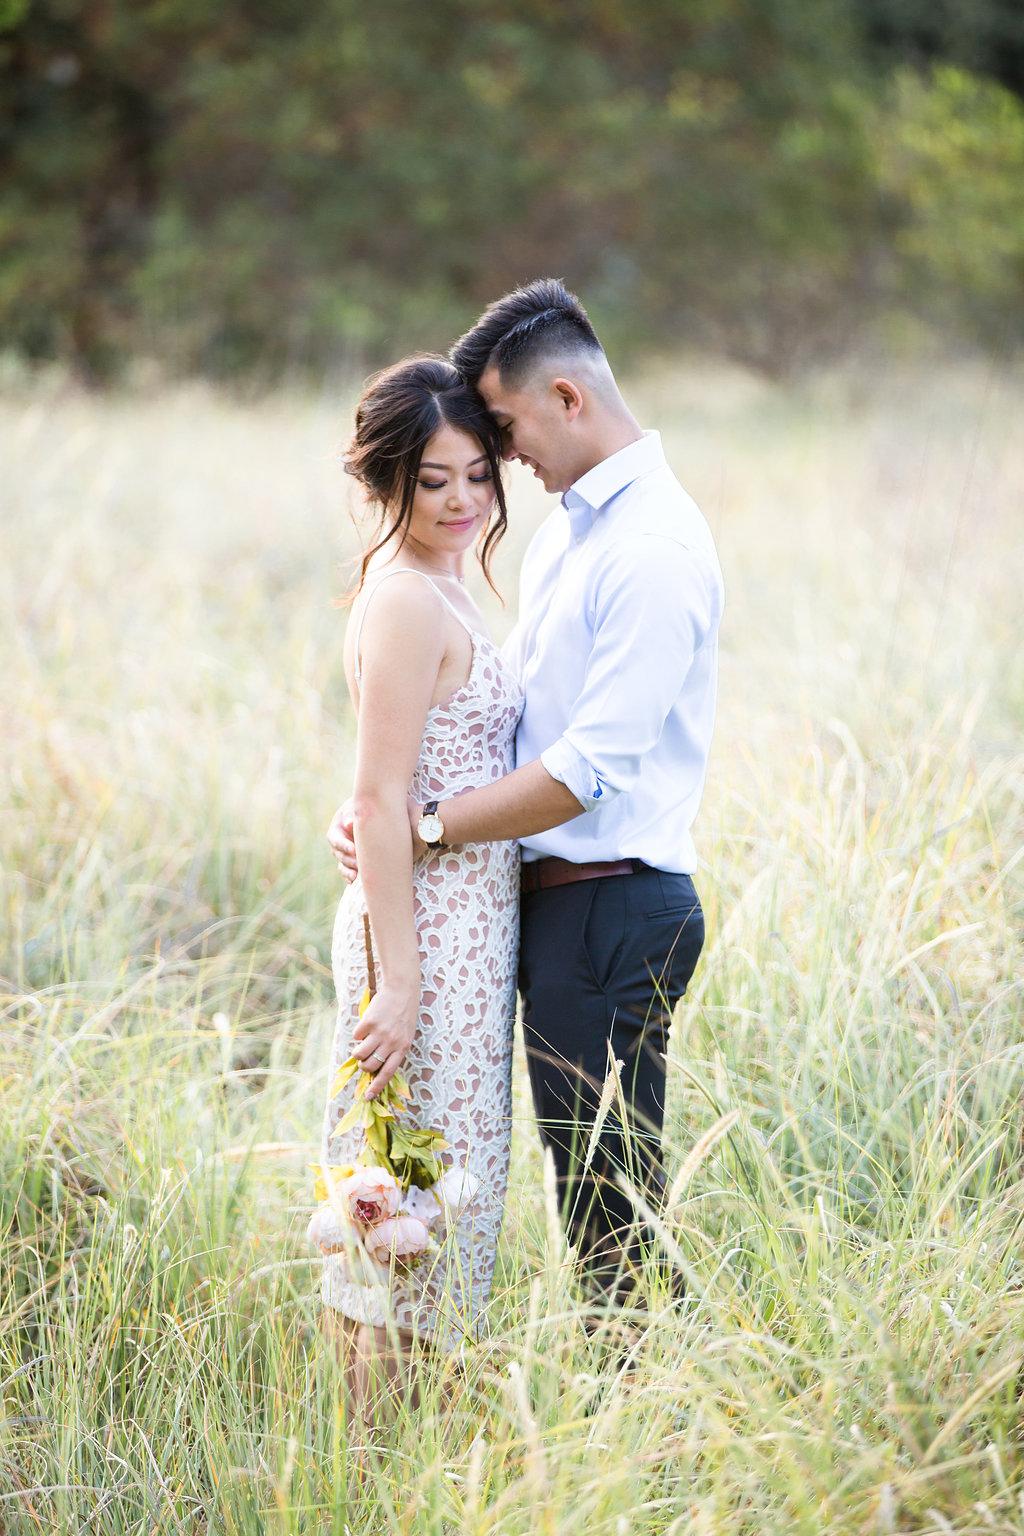 Sydney Professional Wedding Photographer - Asian Weddings - Jennifer Lam Photography - Centennial Parklands (21).jpg